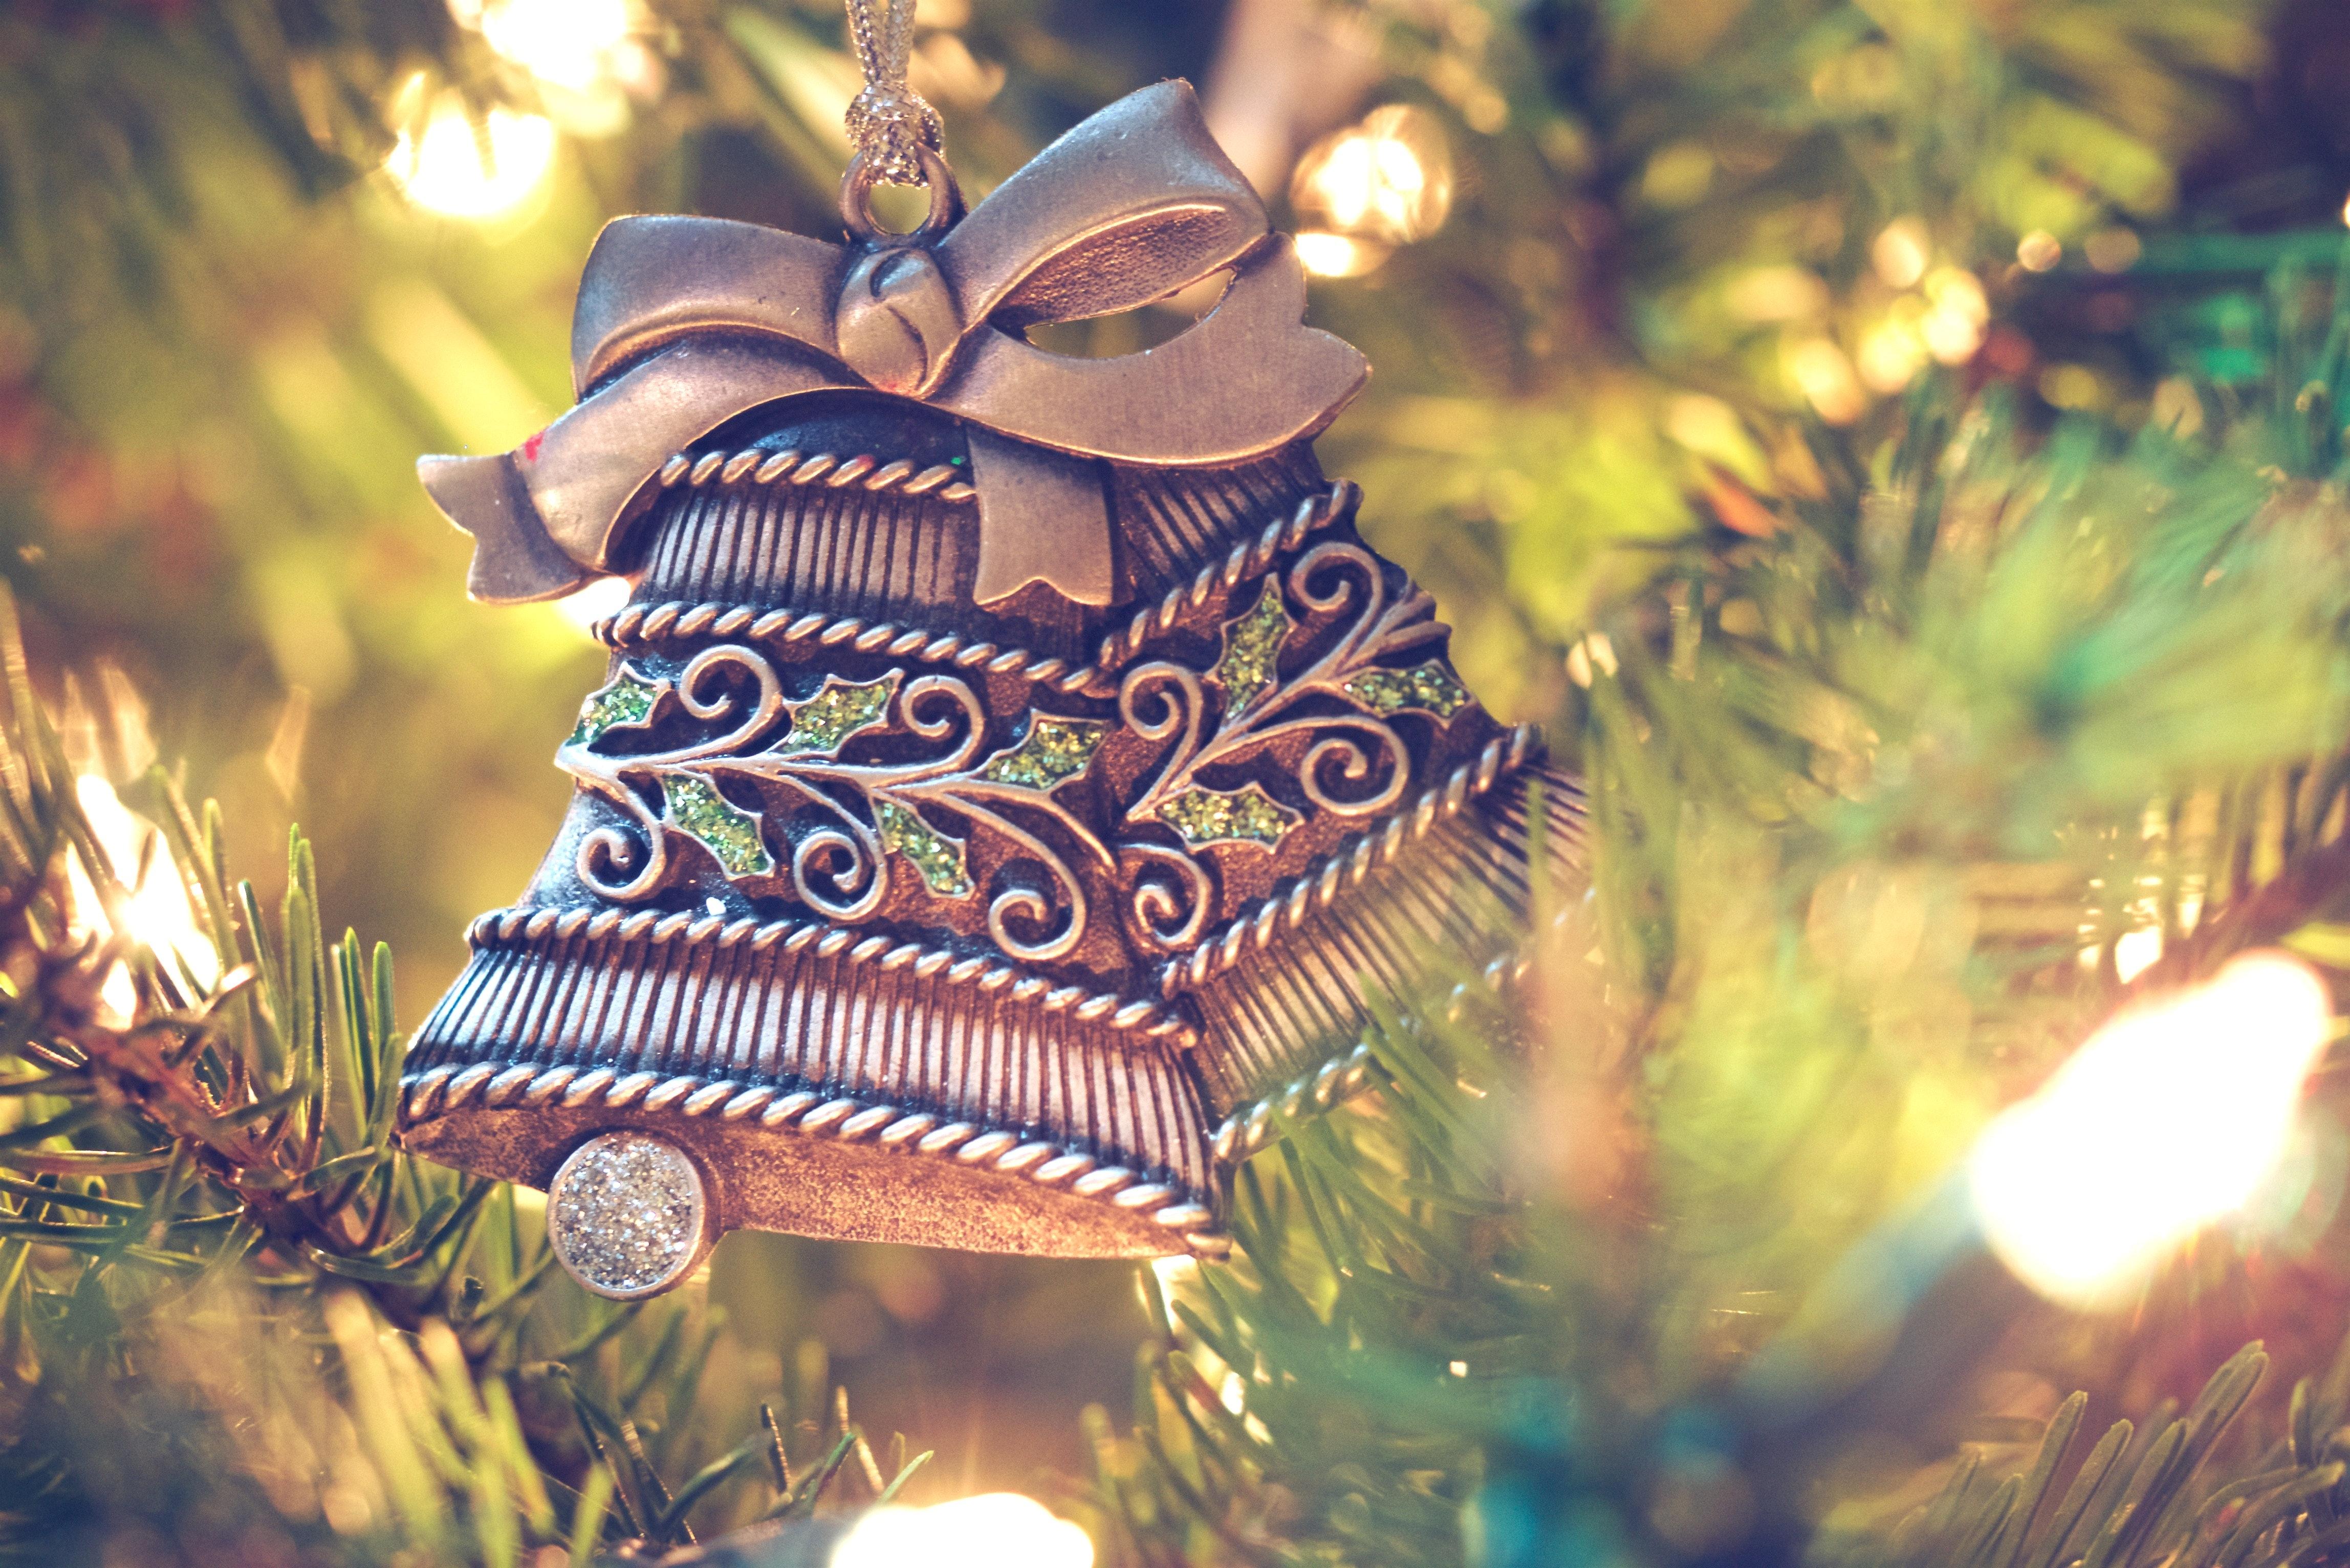 Christmas Music Images.Does Christmas Music Make You Buy More Retail Soundtracks